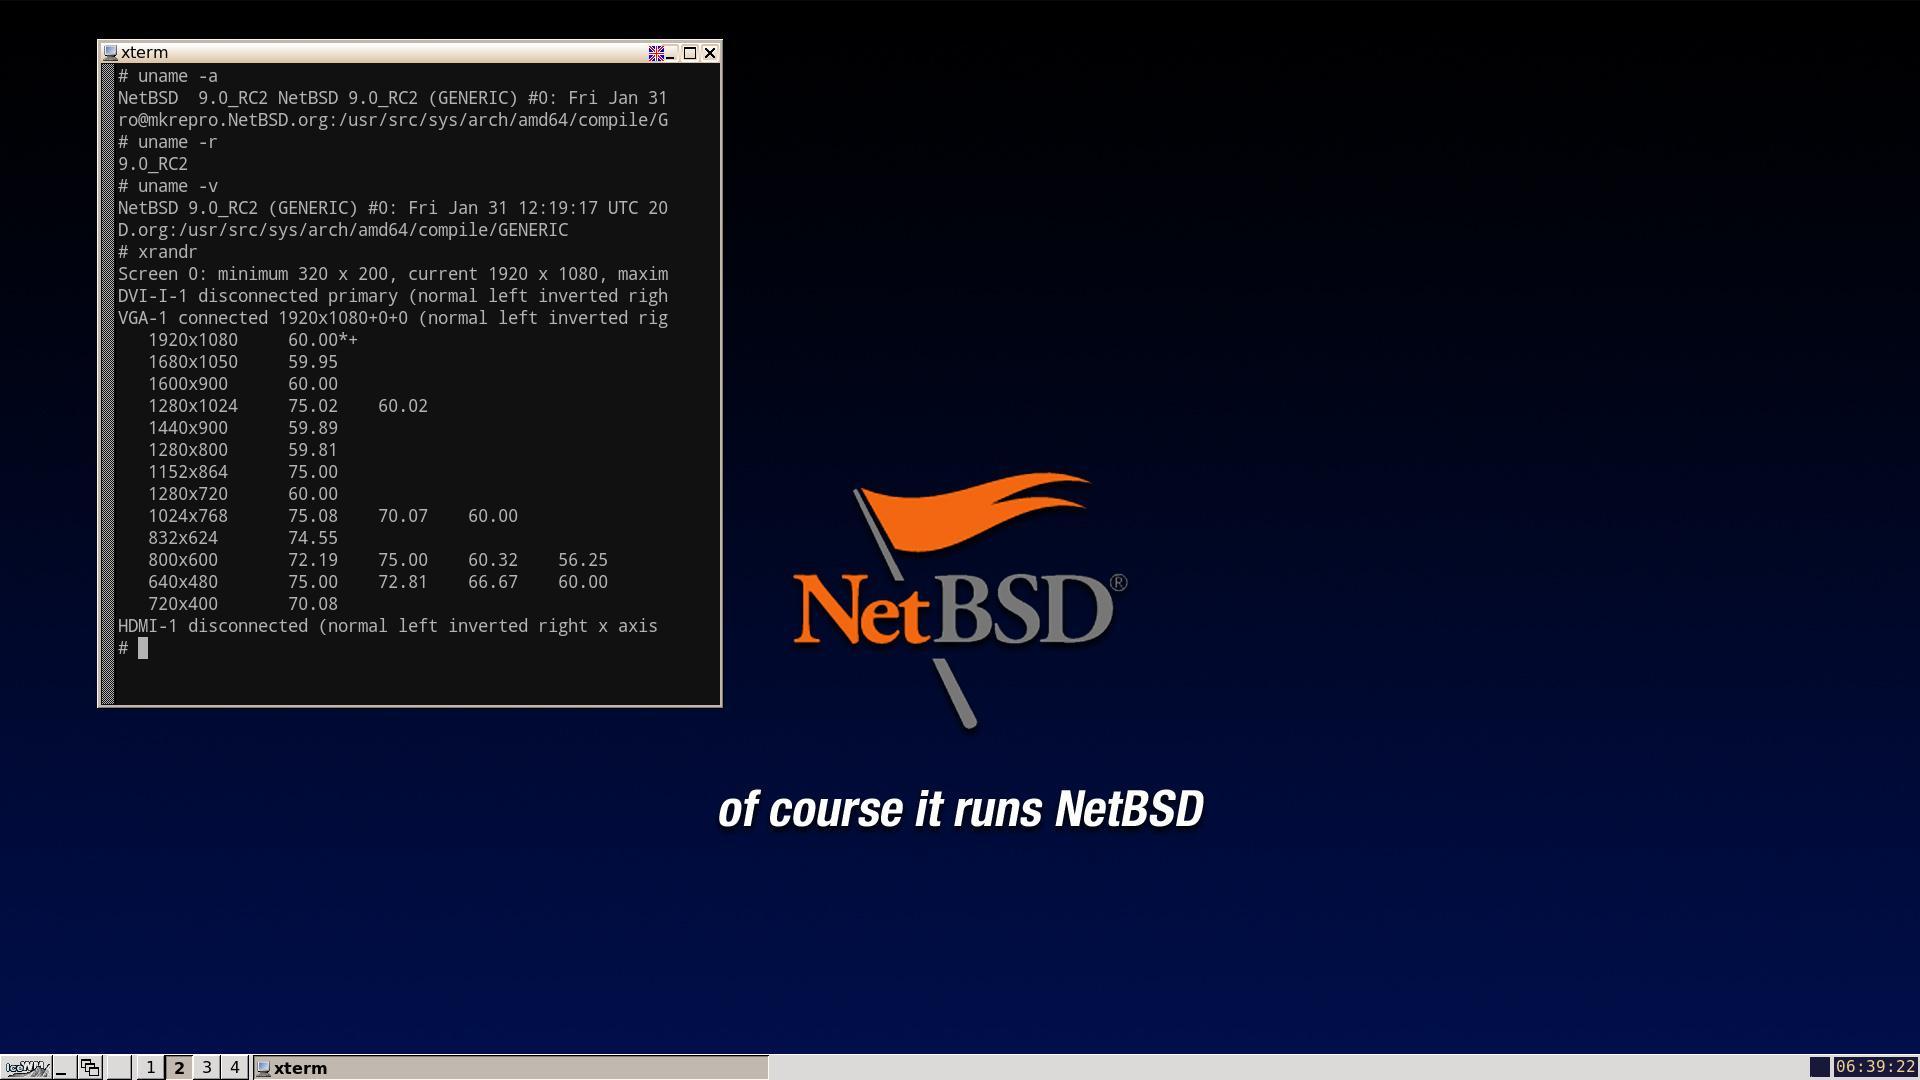 NetBSD NVidia GTX 550 Ti